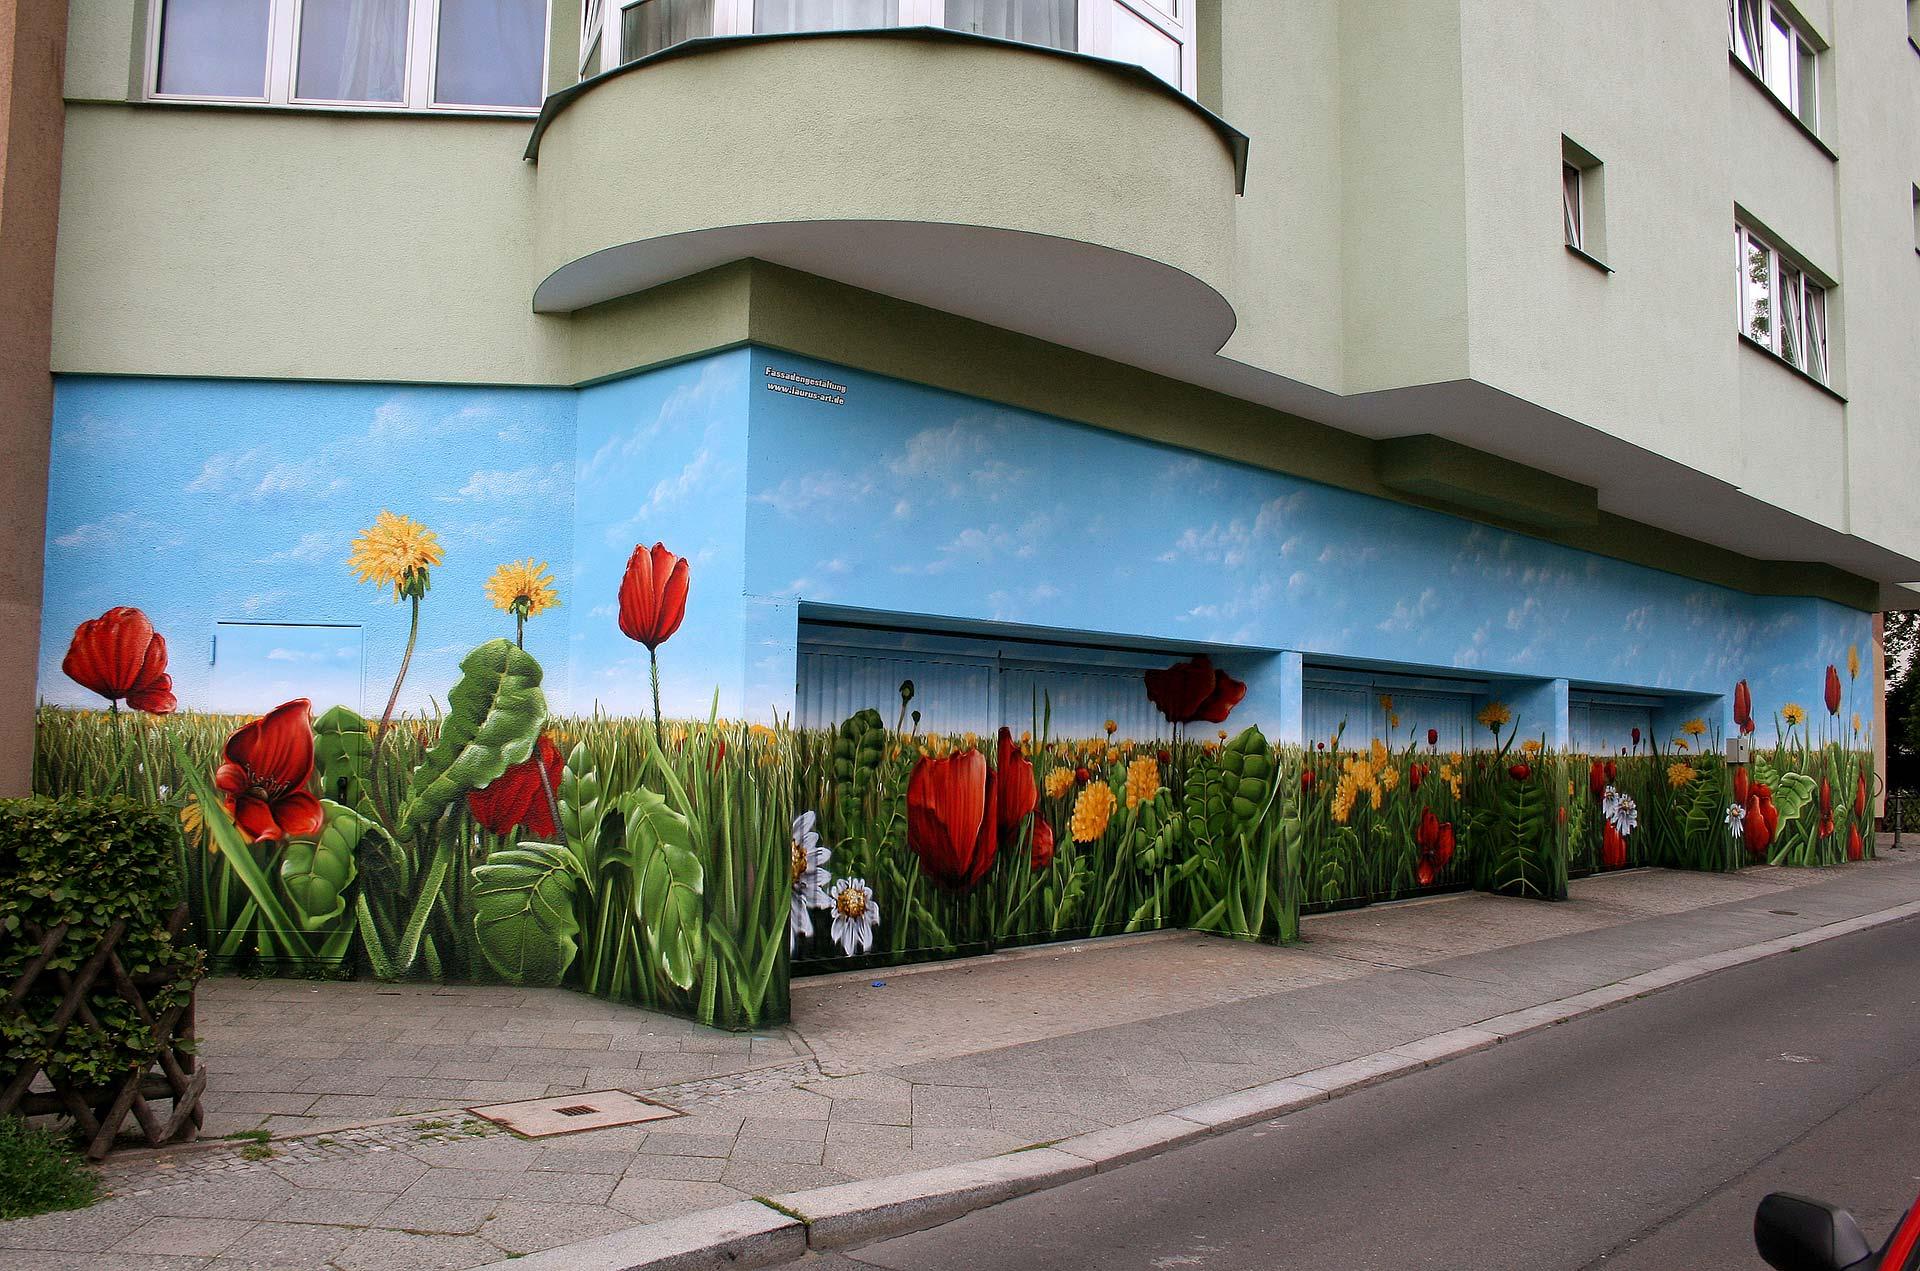 Putlitzstraße